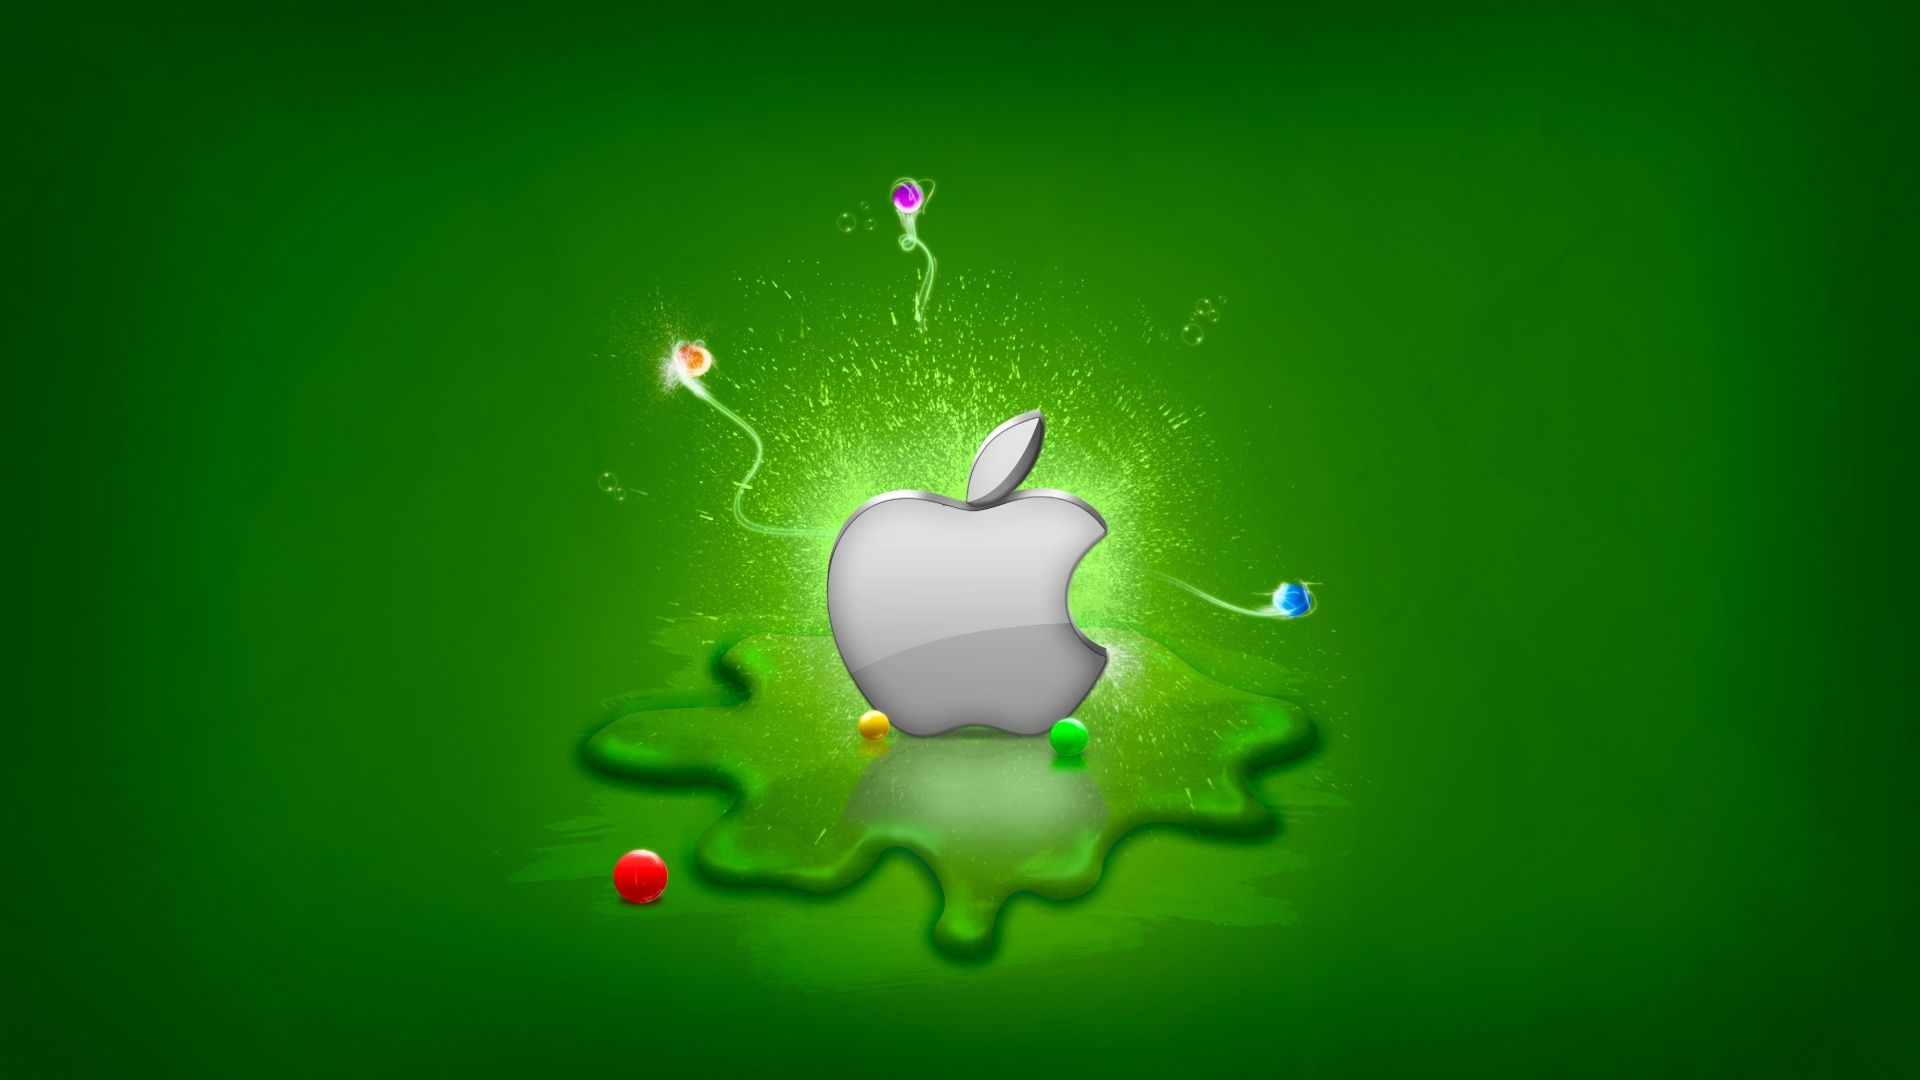 Hd wallpaper macbook - Apple Logo Purple Image Hd Wallpaper Wallpaper Themes